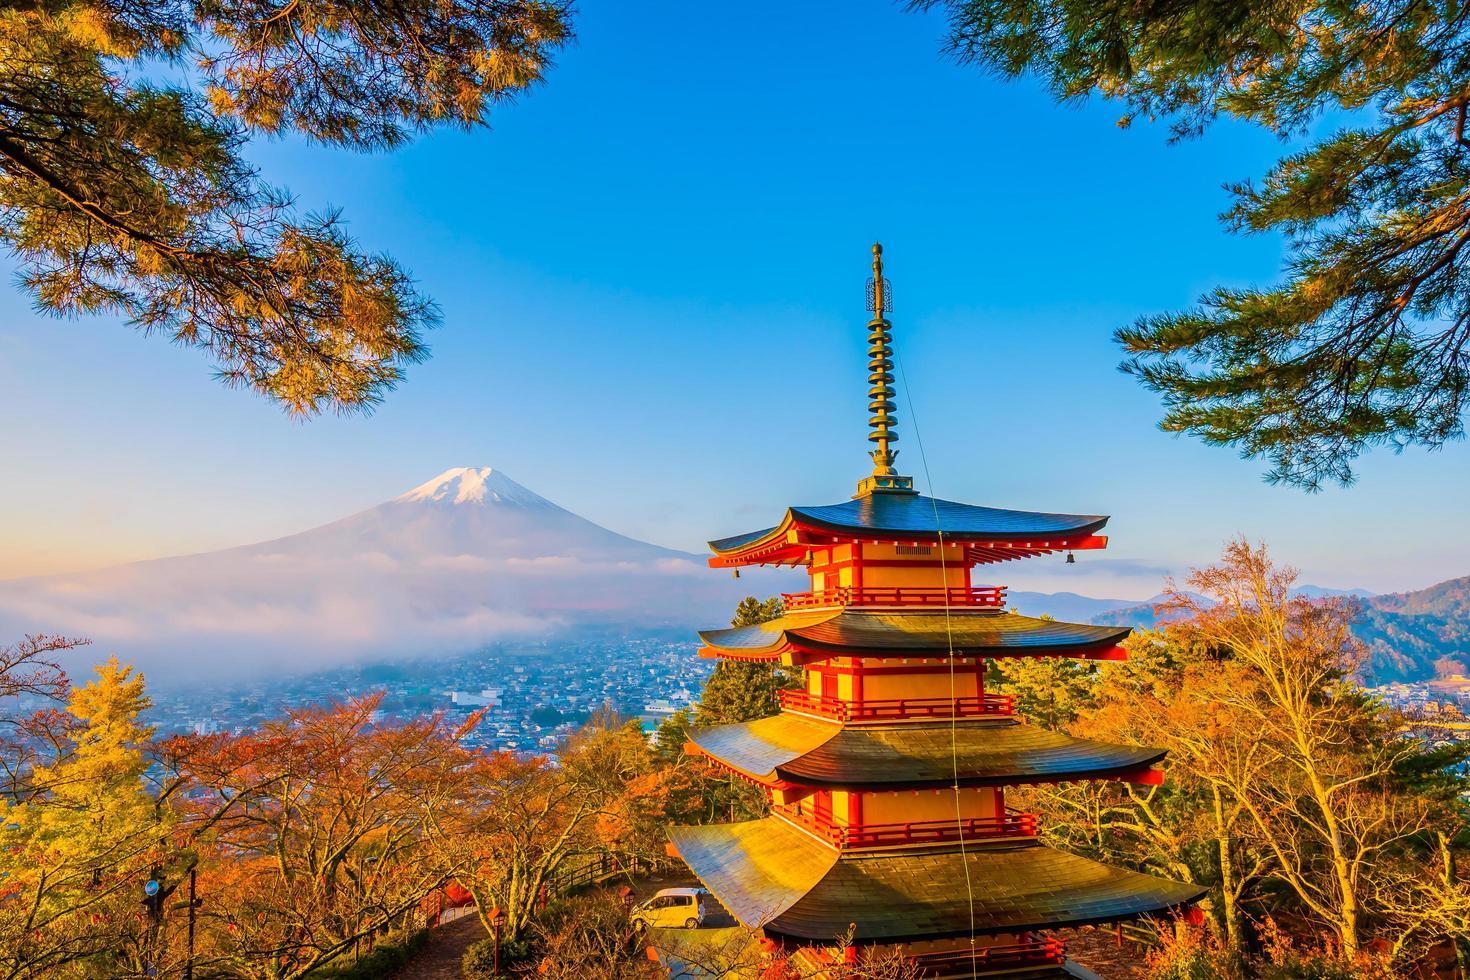 Mt. Fuji with Chureito pagoda in Japan photo